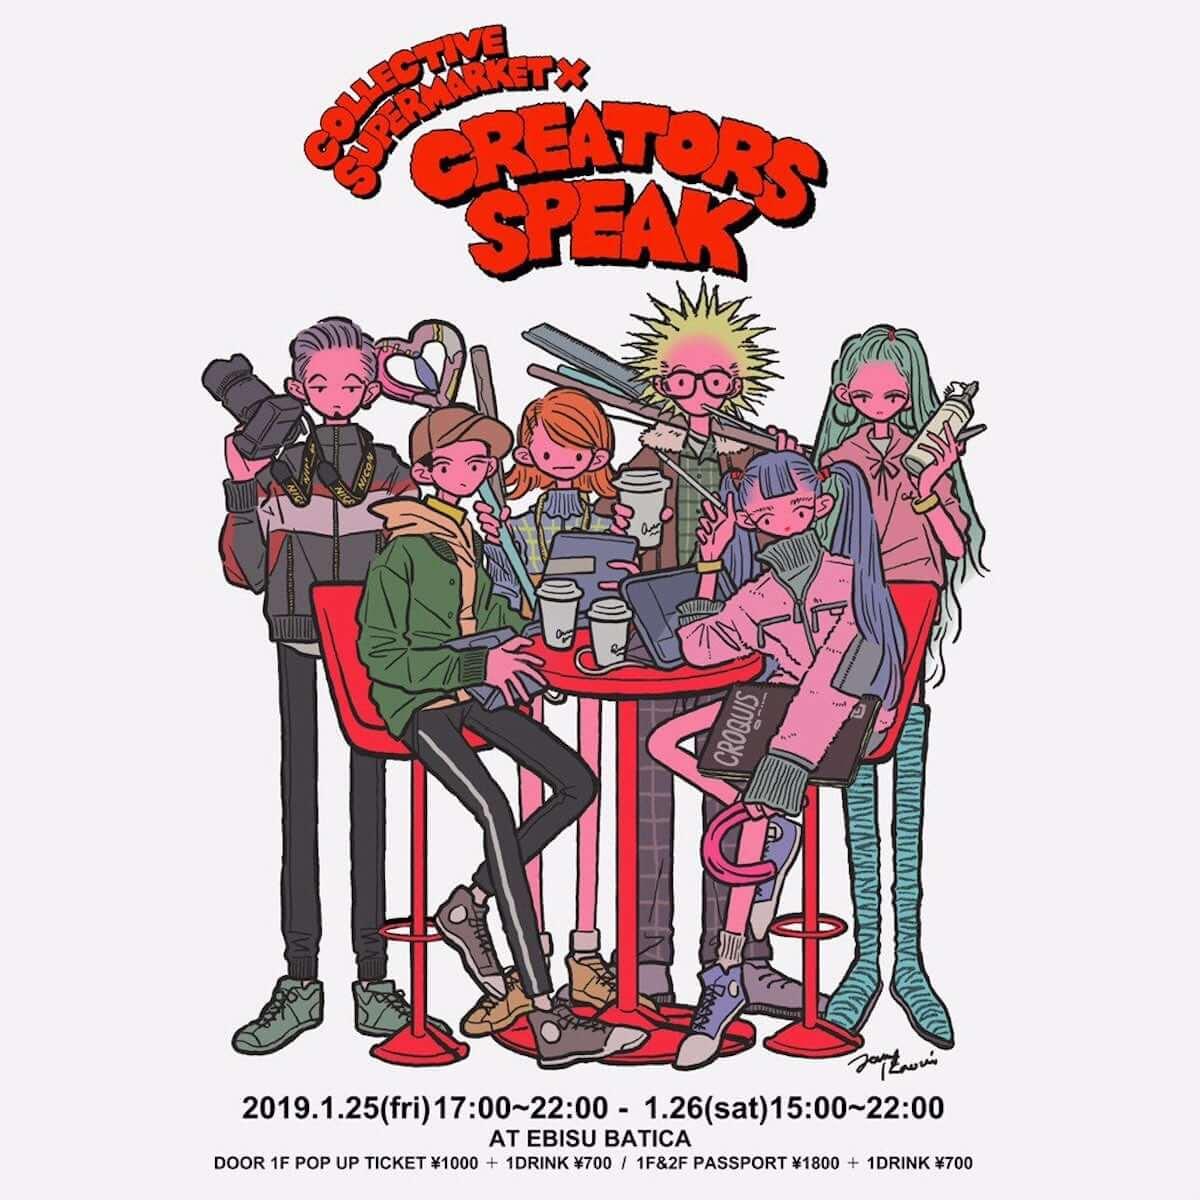 Creators Speak:Profile 5 津野青嵐さん azyazyazy-1200x1200